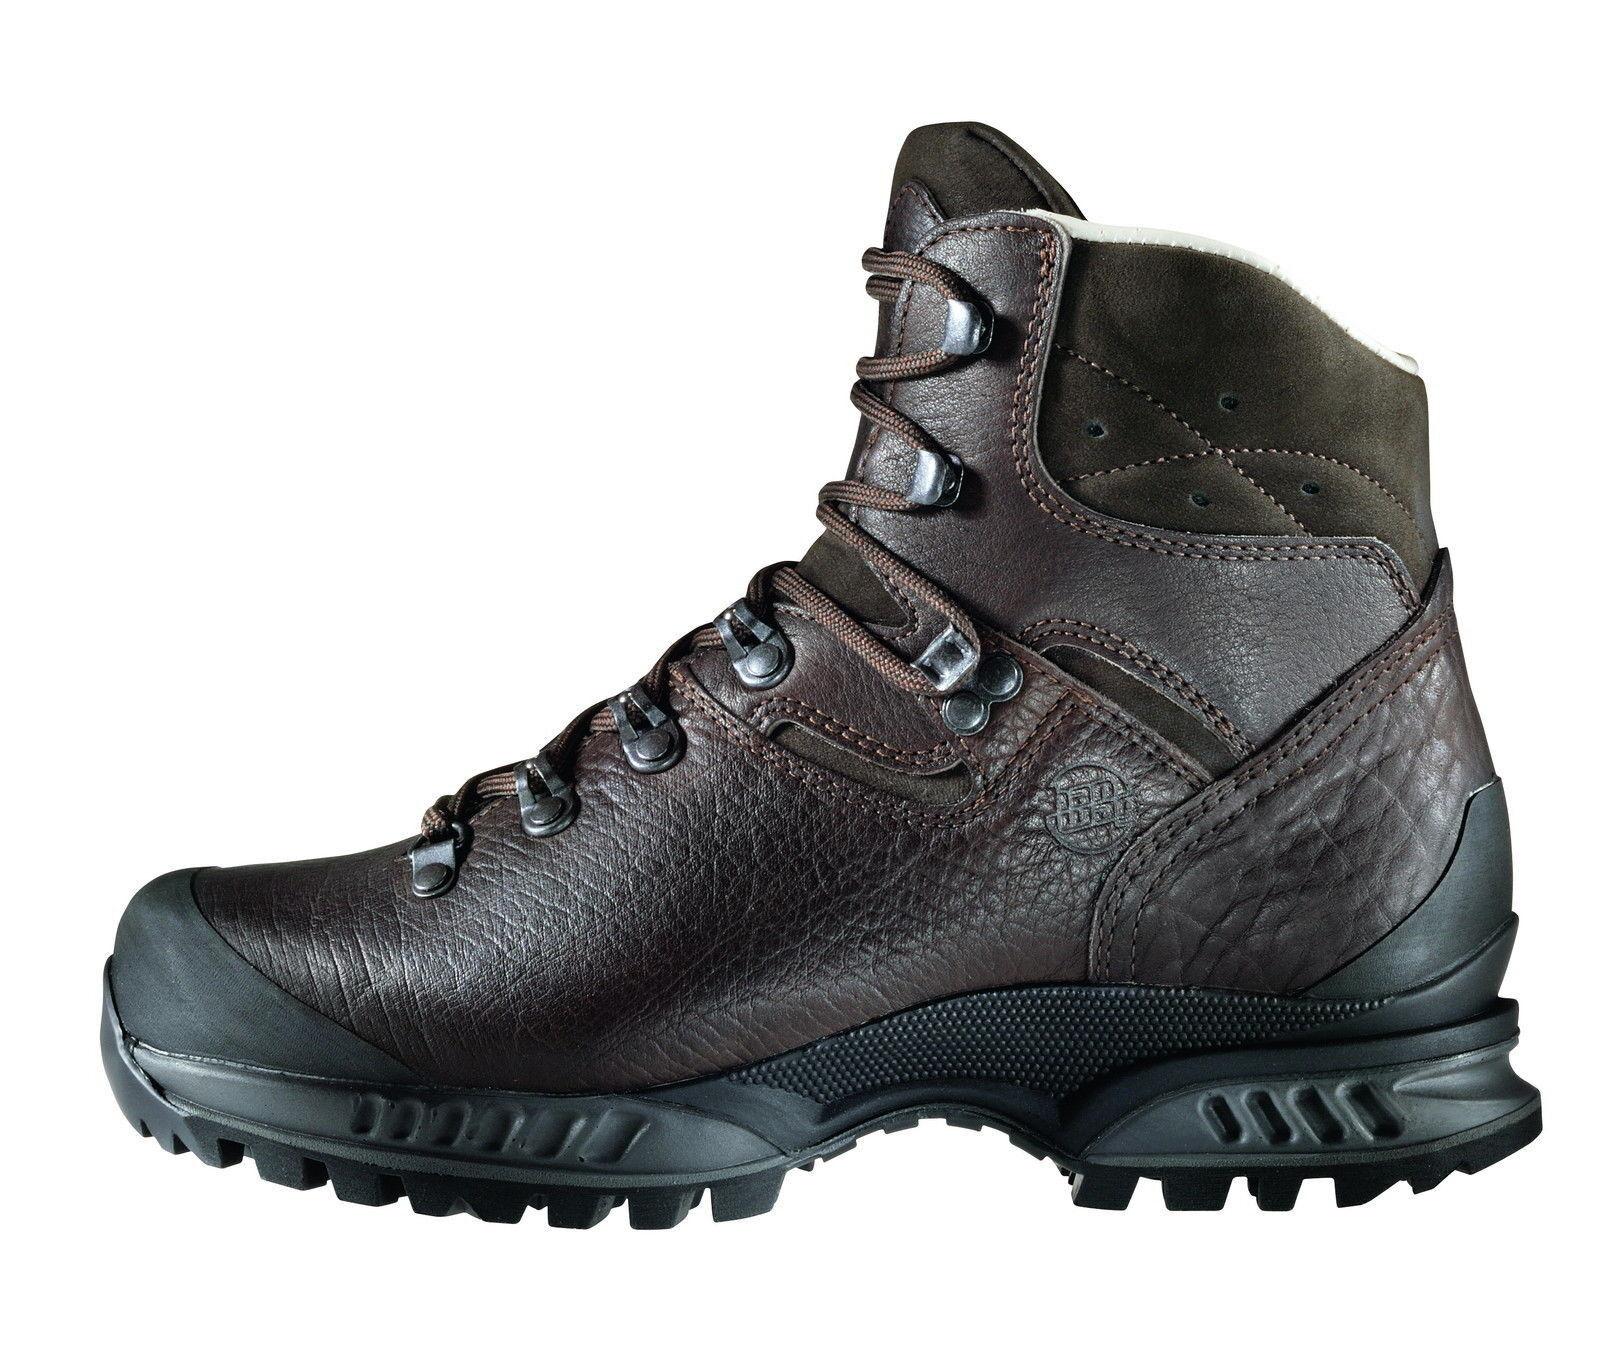 Hanwag Senderismo Yak Zapatos Lhasa Tamaño 11-46 Castaño